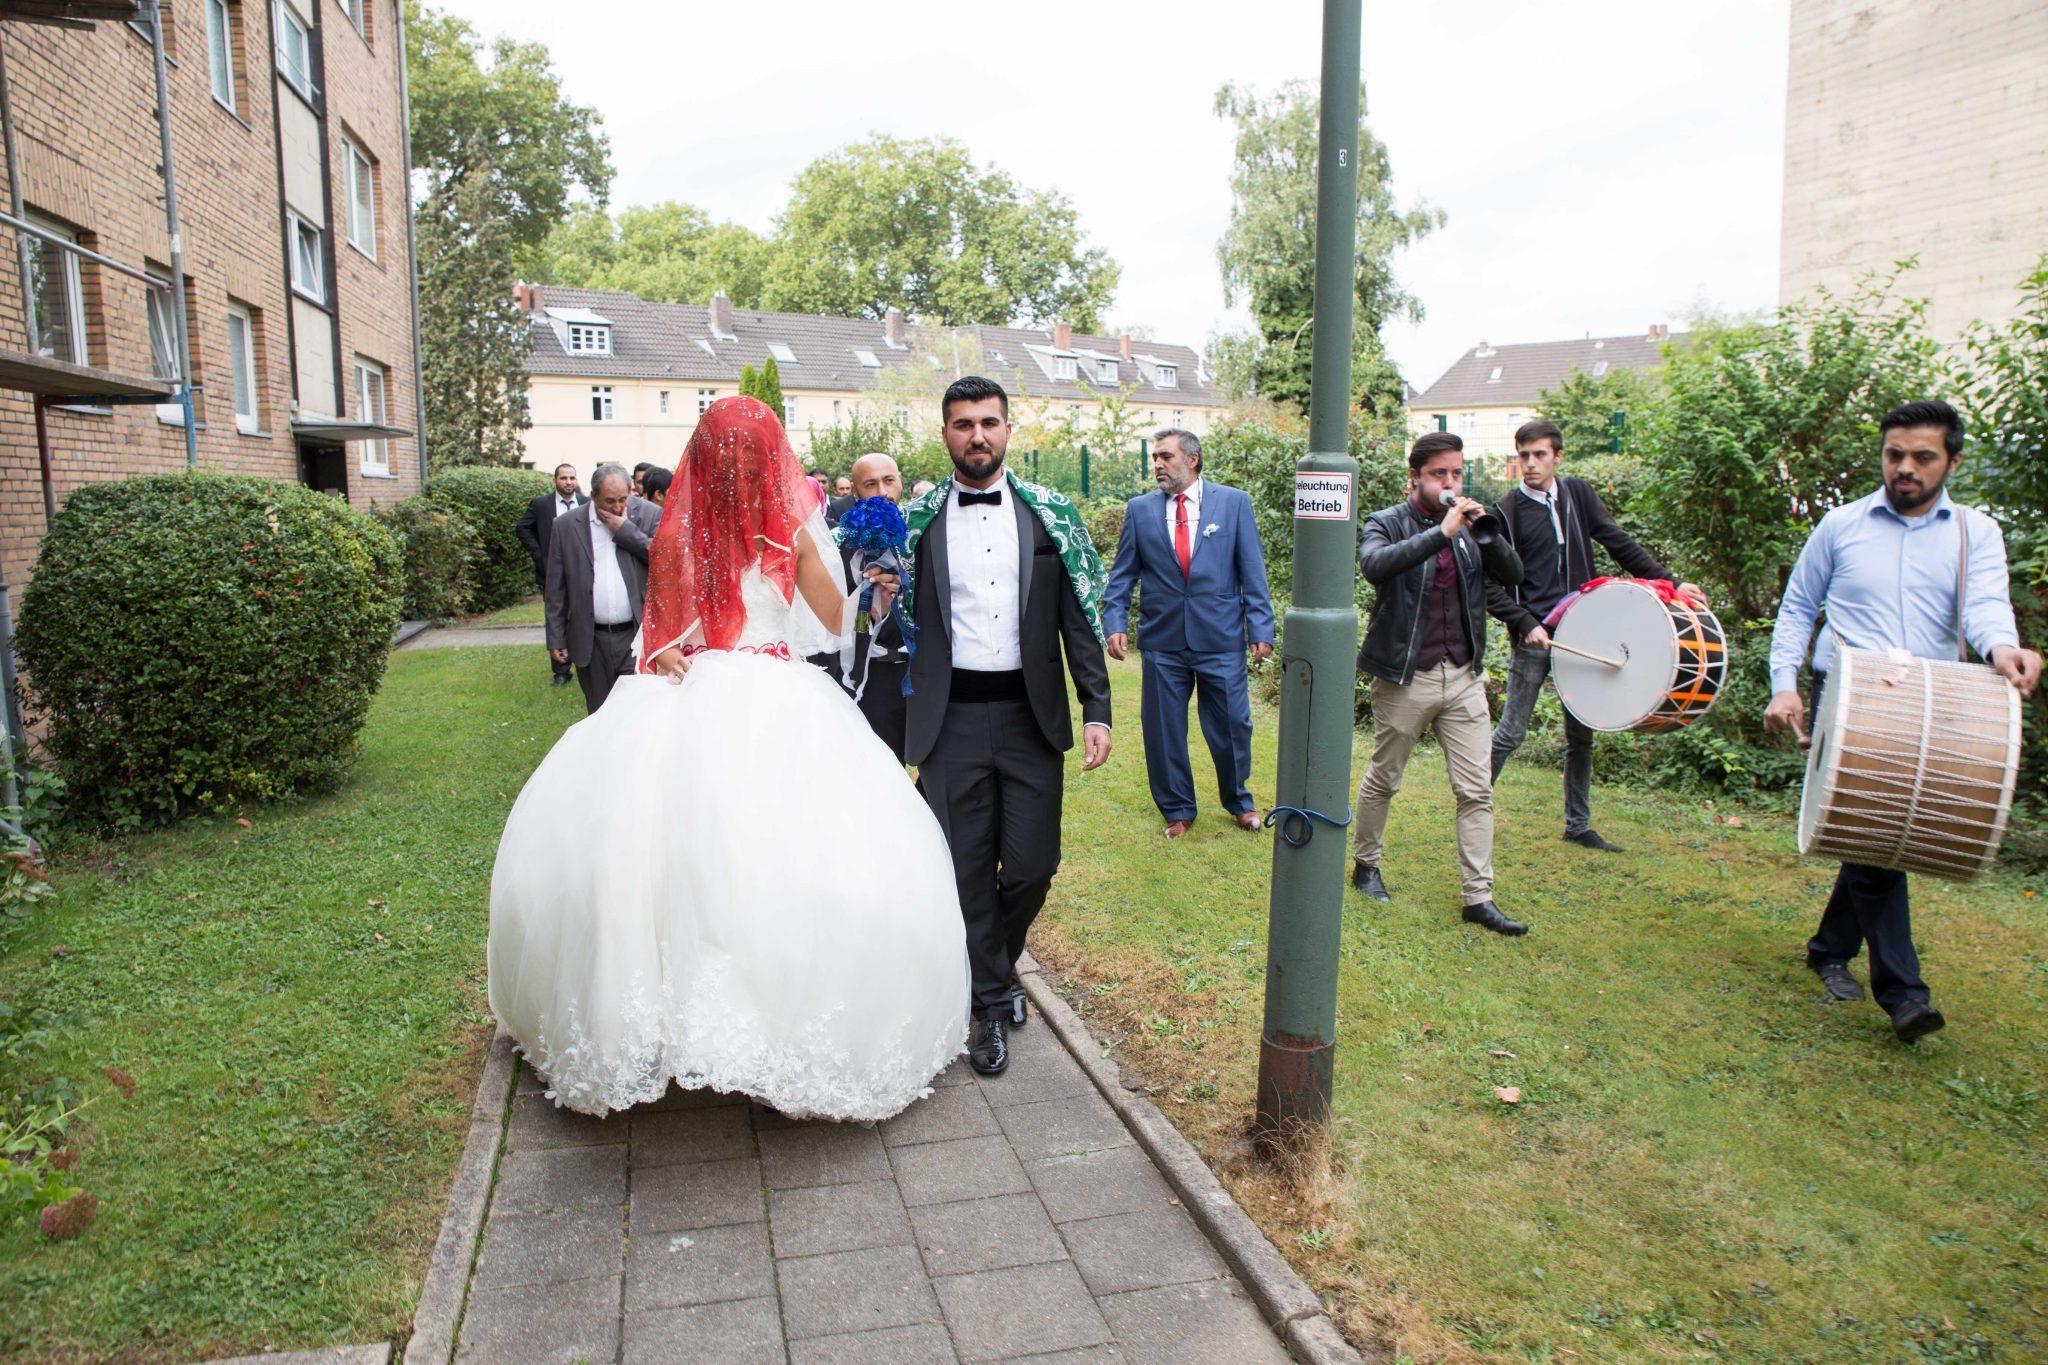 türkischer fotograf hochzeitsfotograf fotografiert braut und bräutigam bei der brautabholung- gelin damat gelin evi kiz evi kiz cikarma dügün fotografcisi